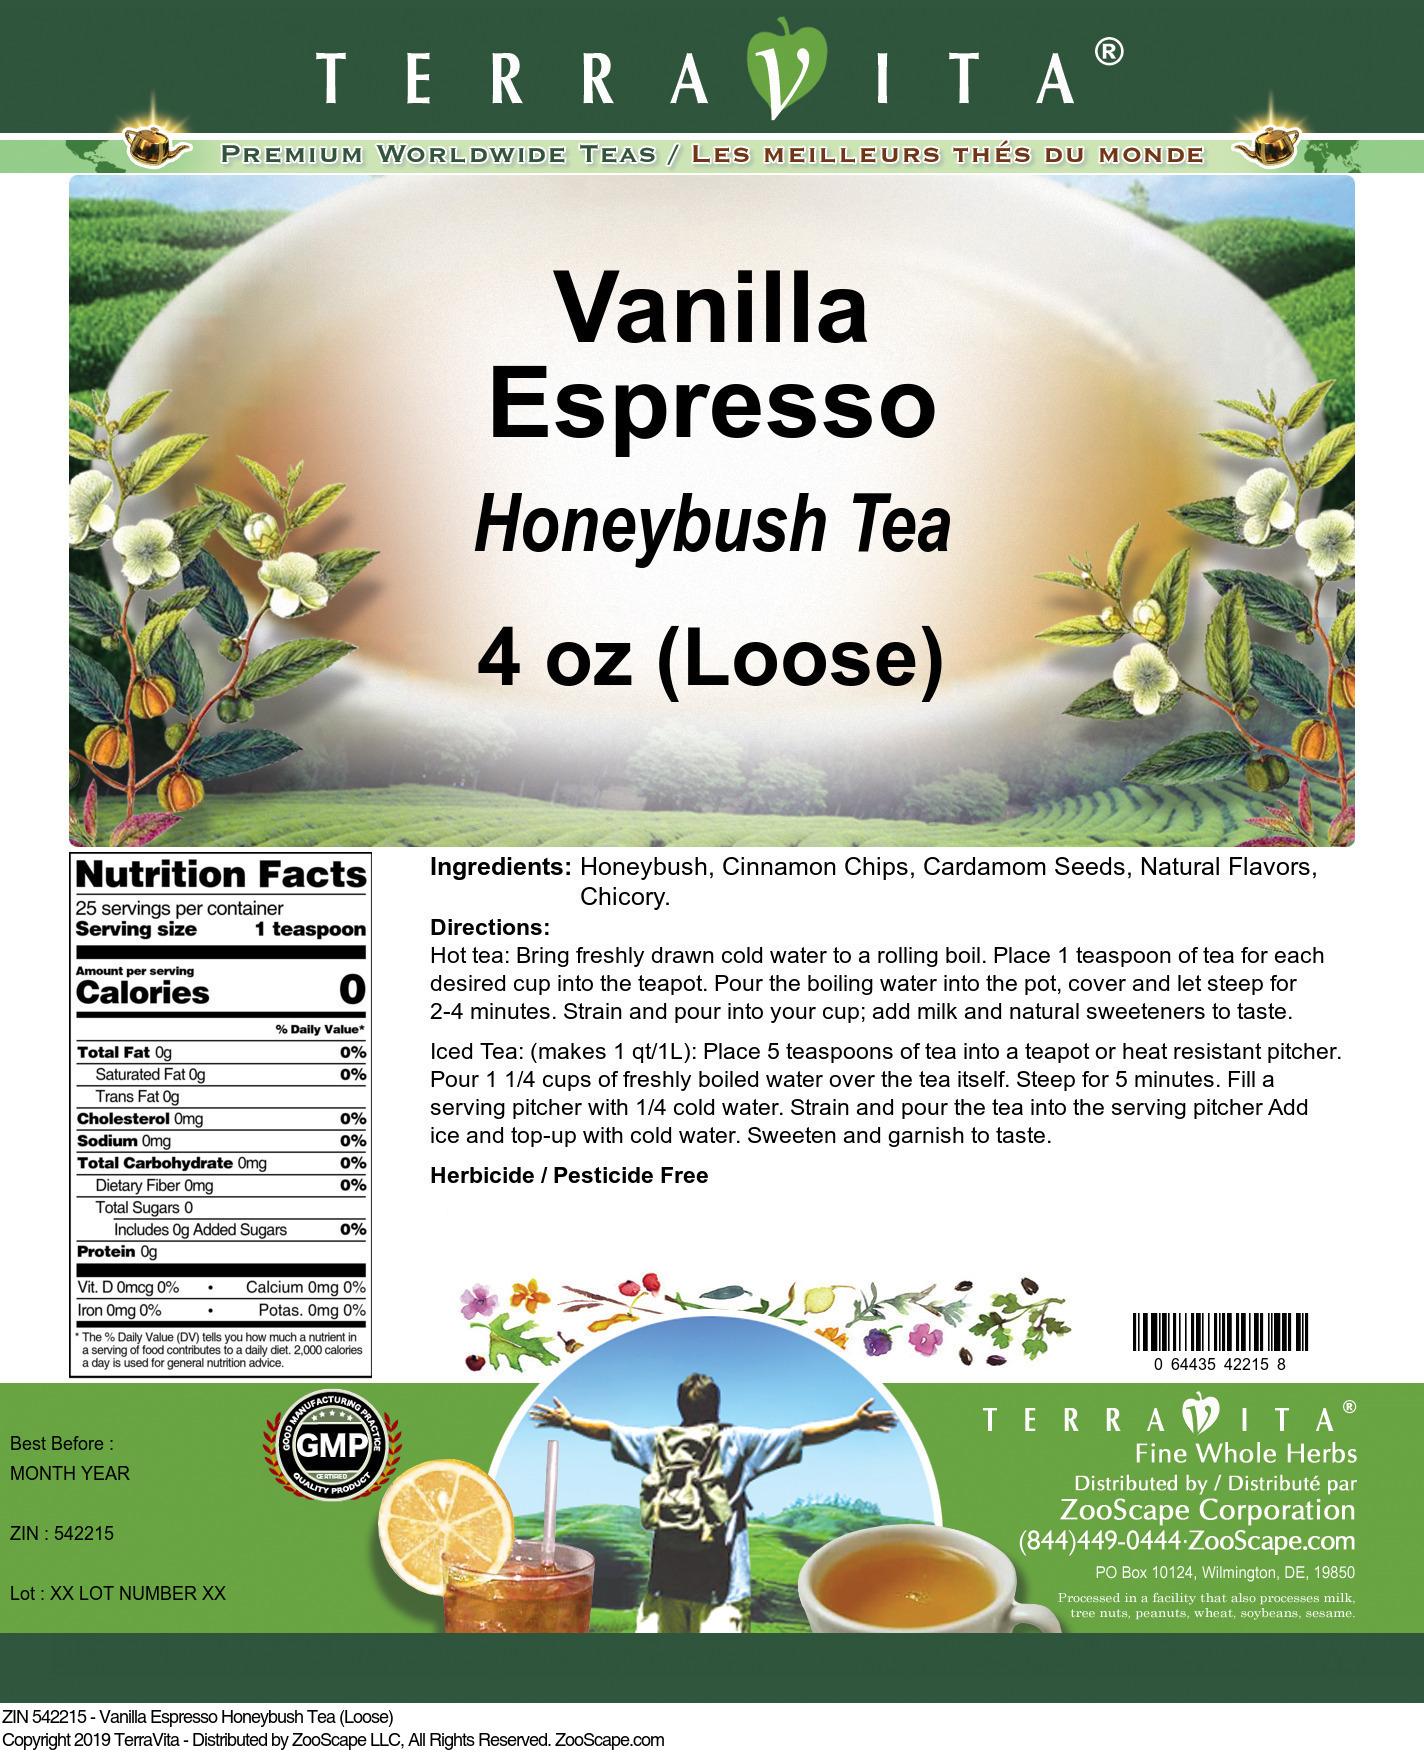 Vanilla Espresso Honeybush Tea